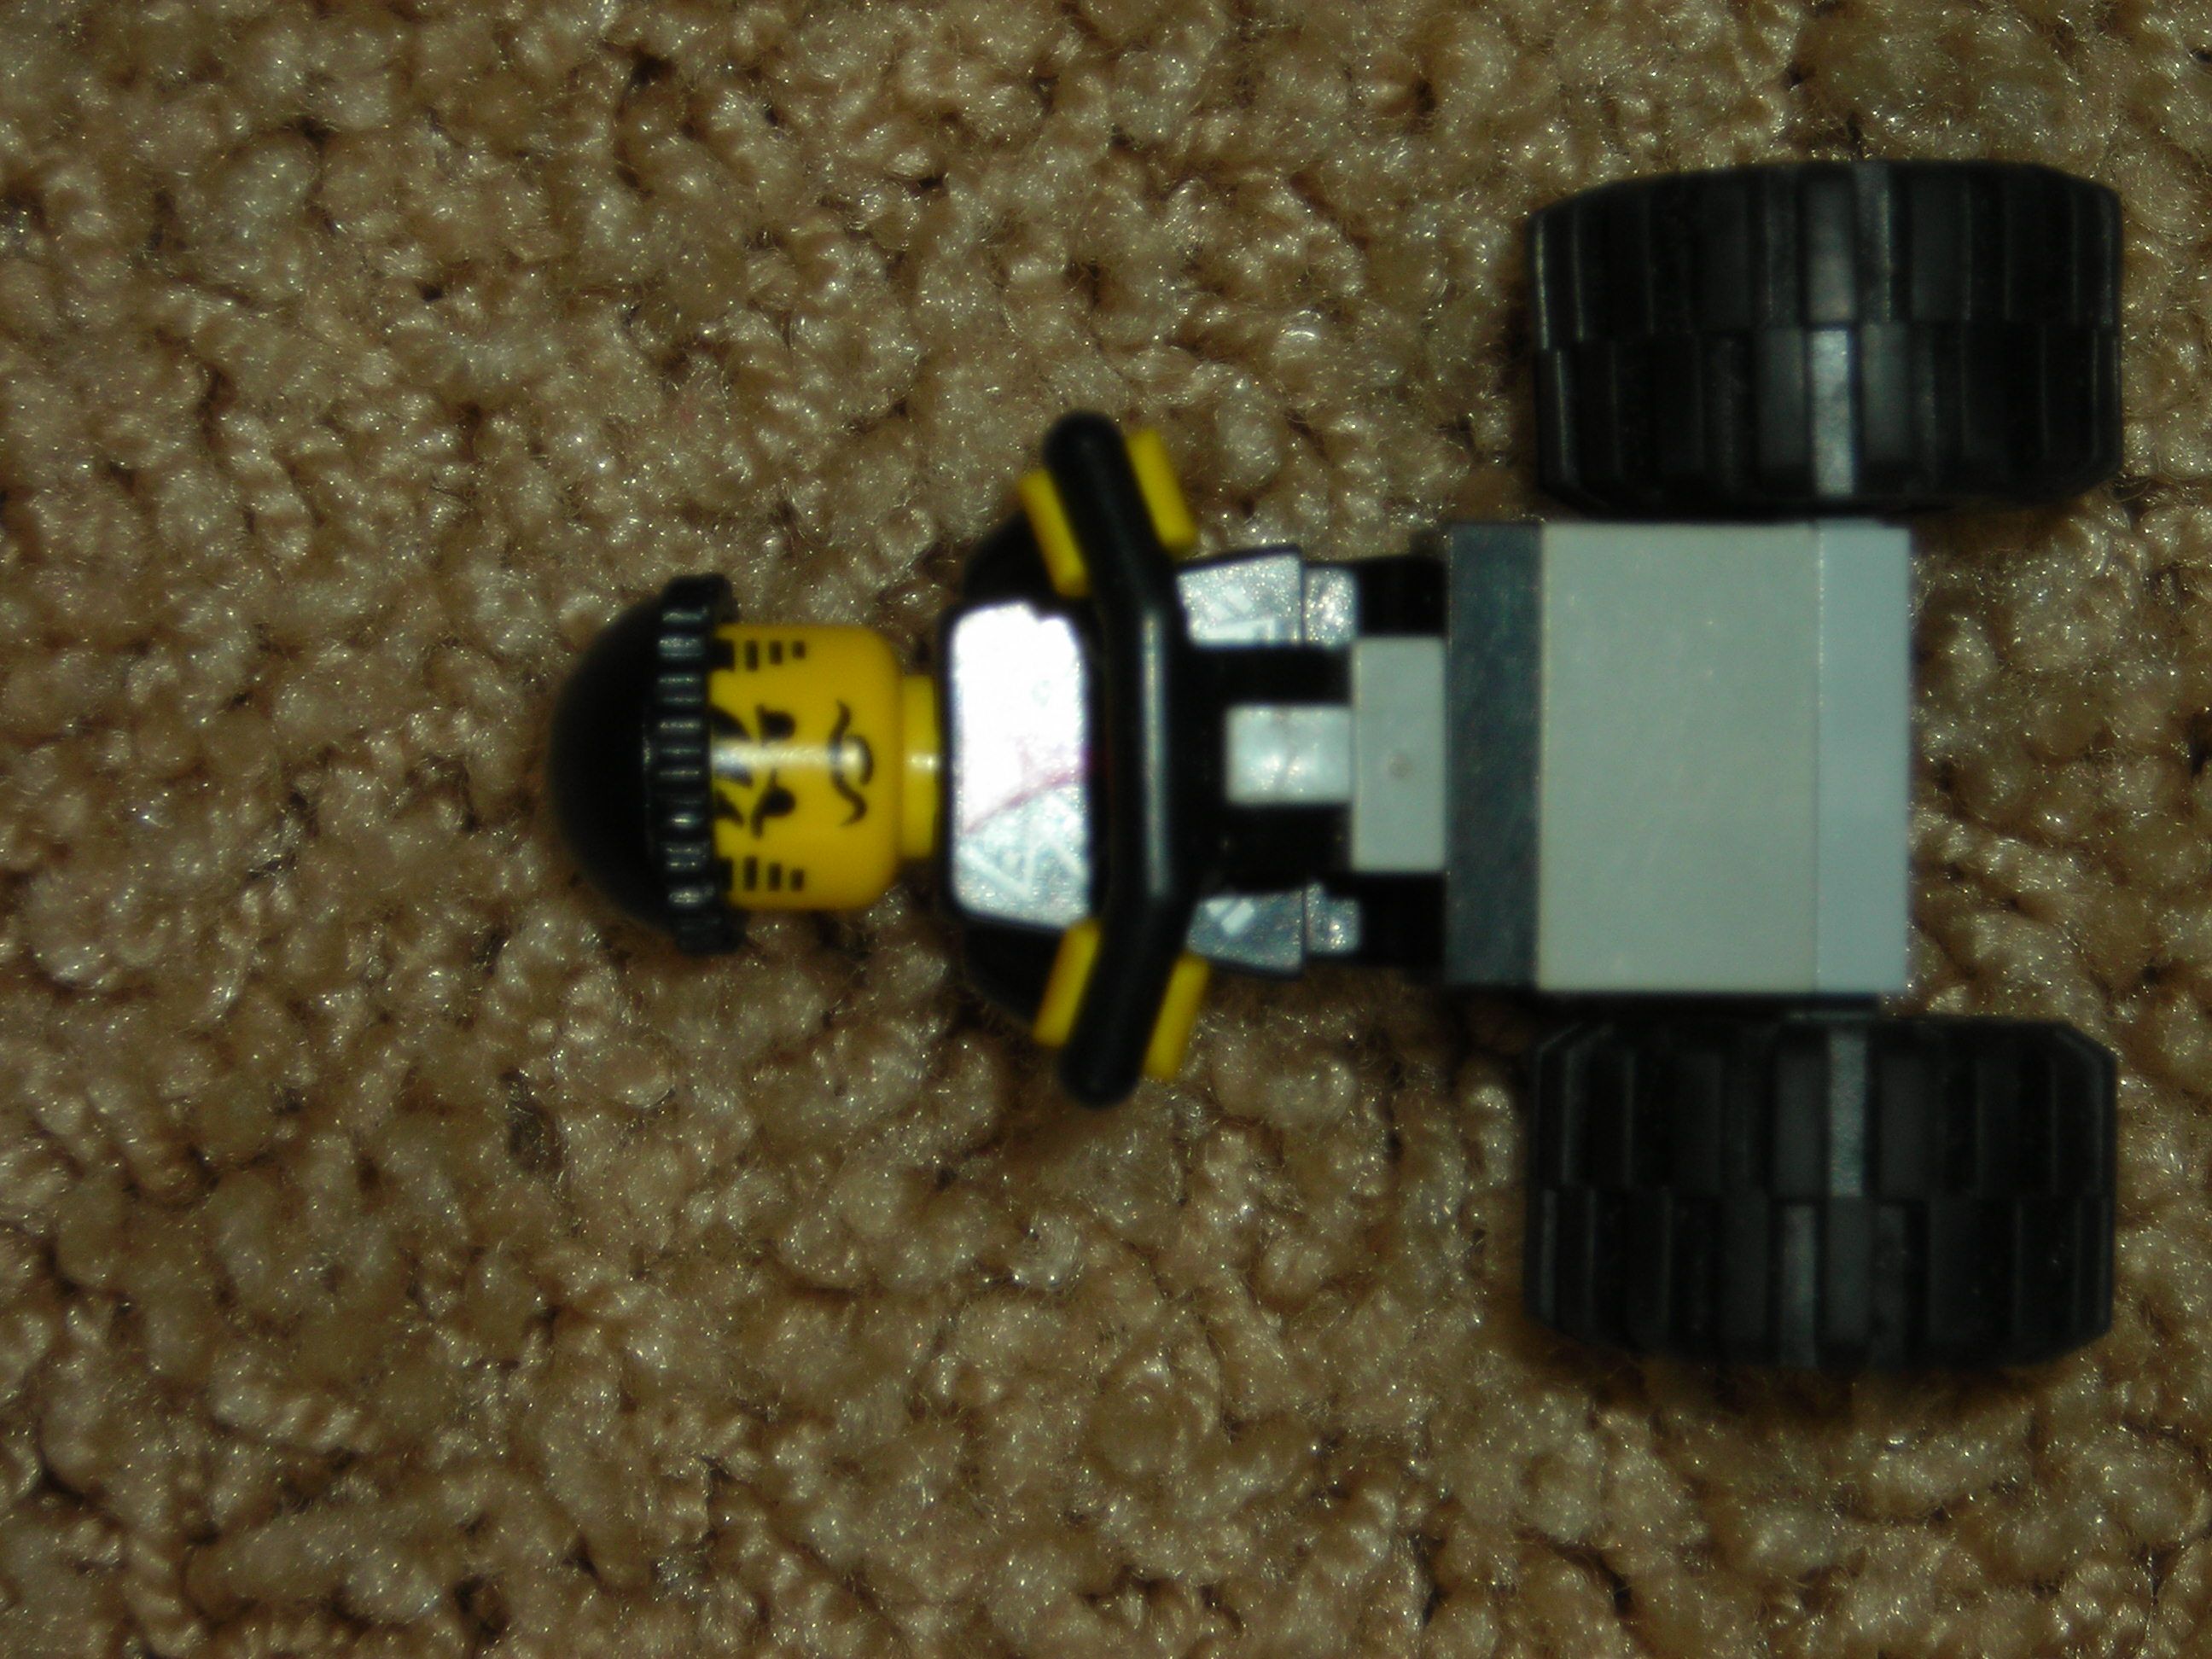 Make a Lego segway